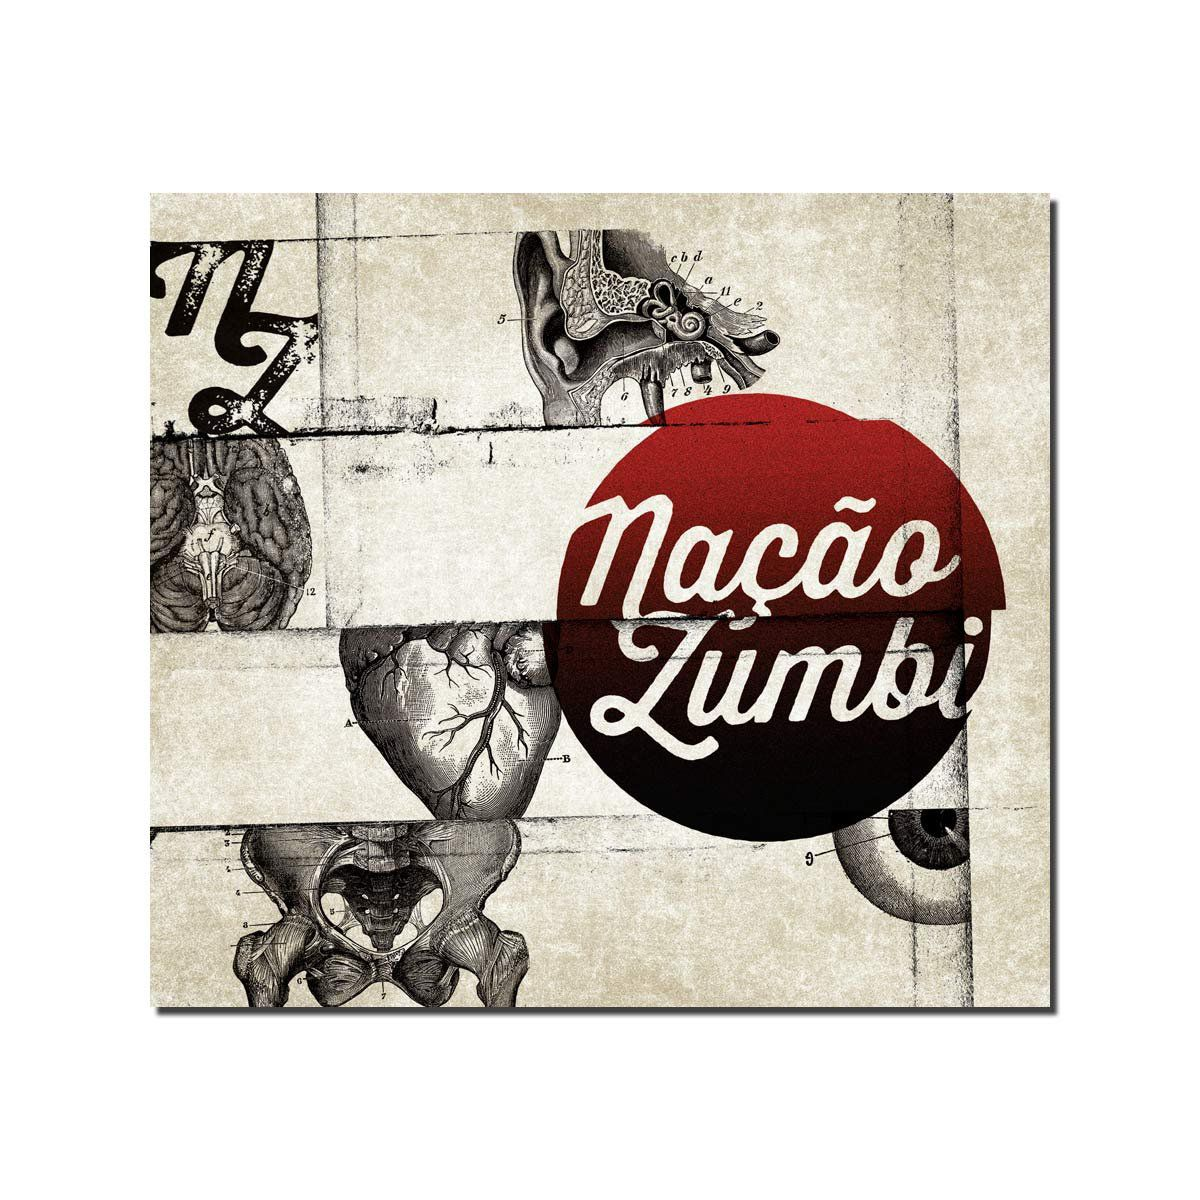 LP Nação Zumbi - Nação Zumbi  - bandUP Store Marketplace